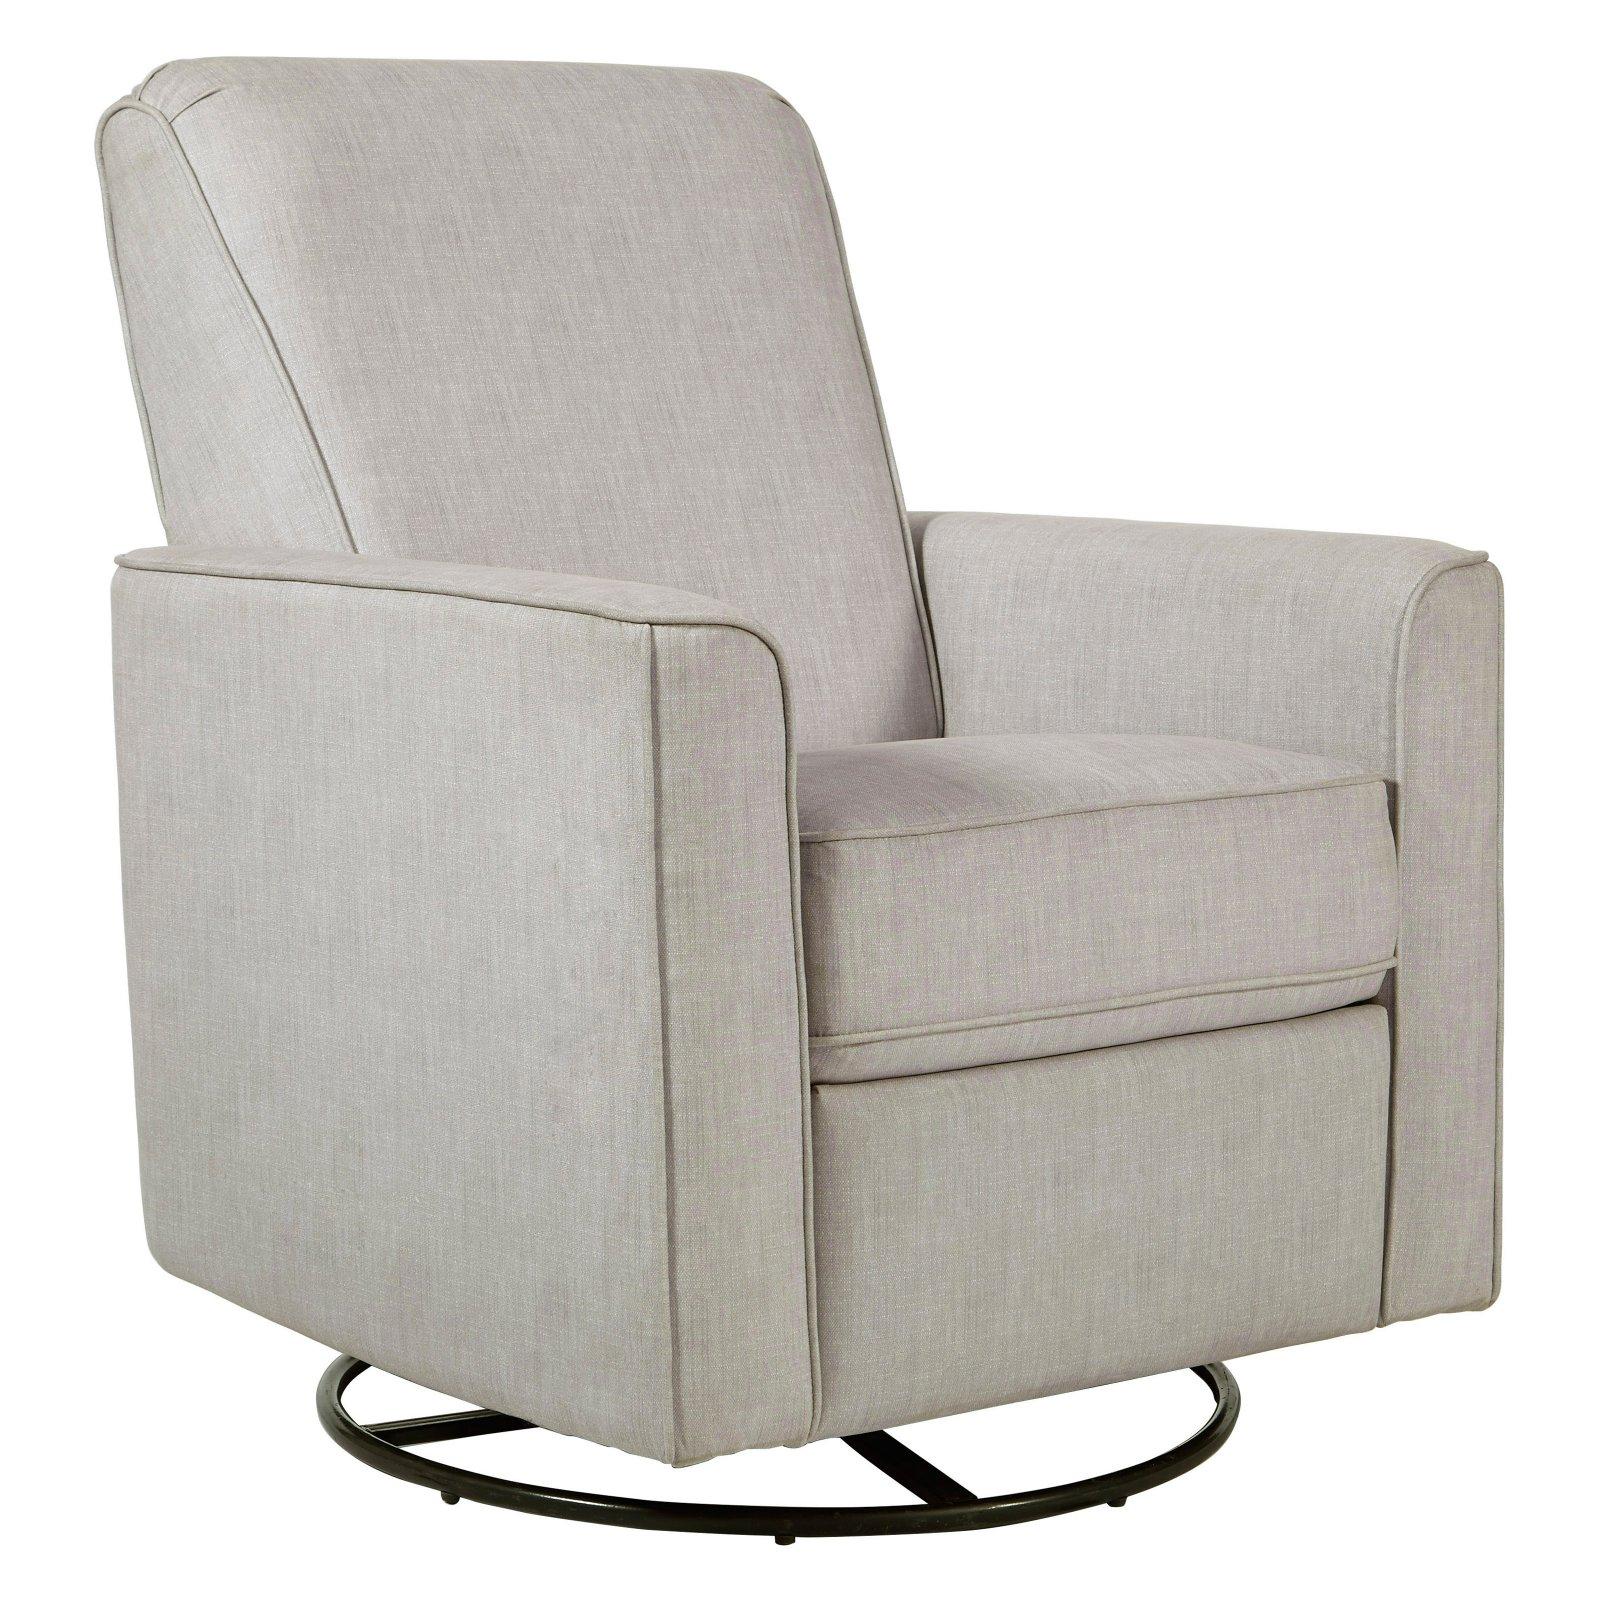 PRI Harmony Carlton Swivel Glider Recliner by Pulaski Furniture